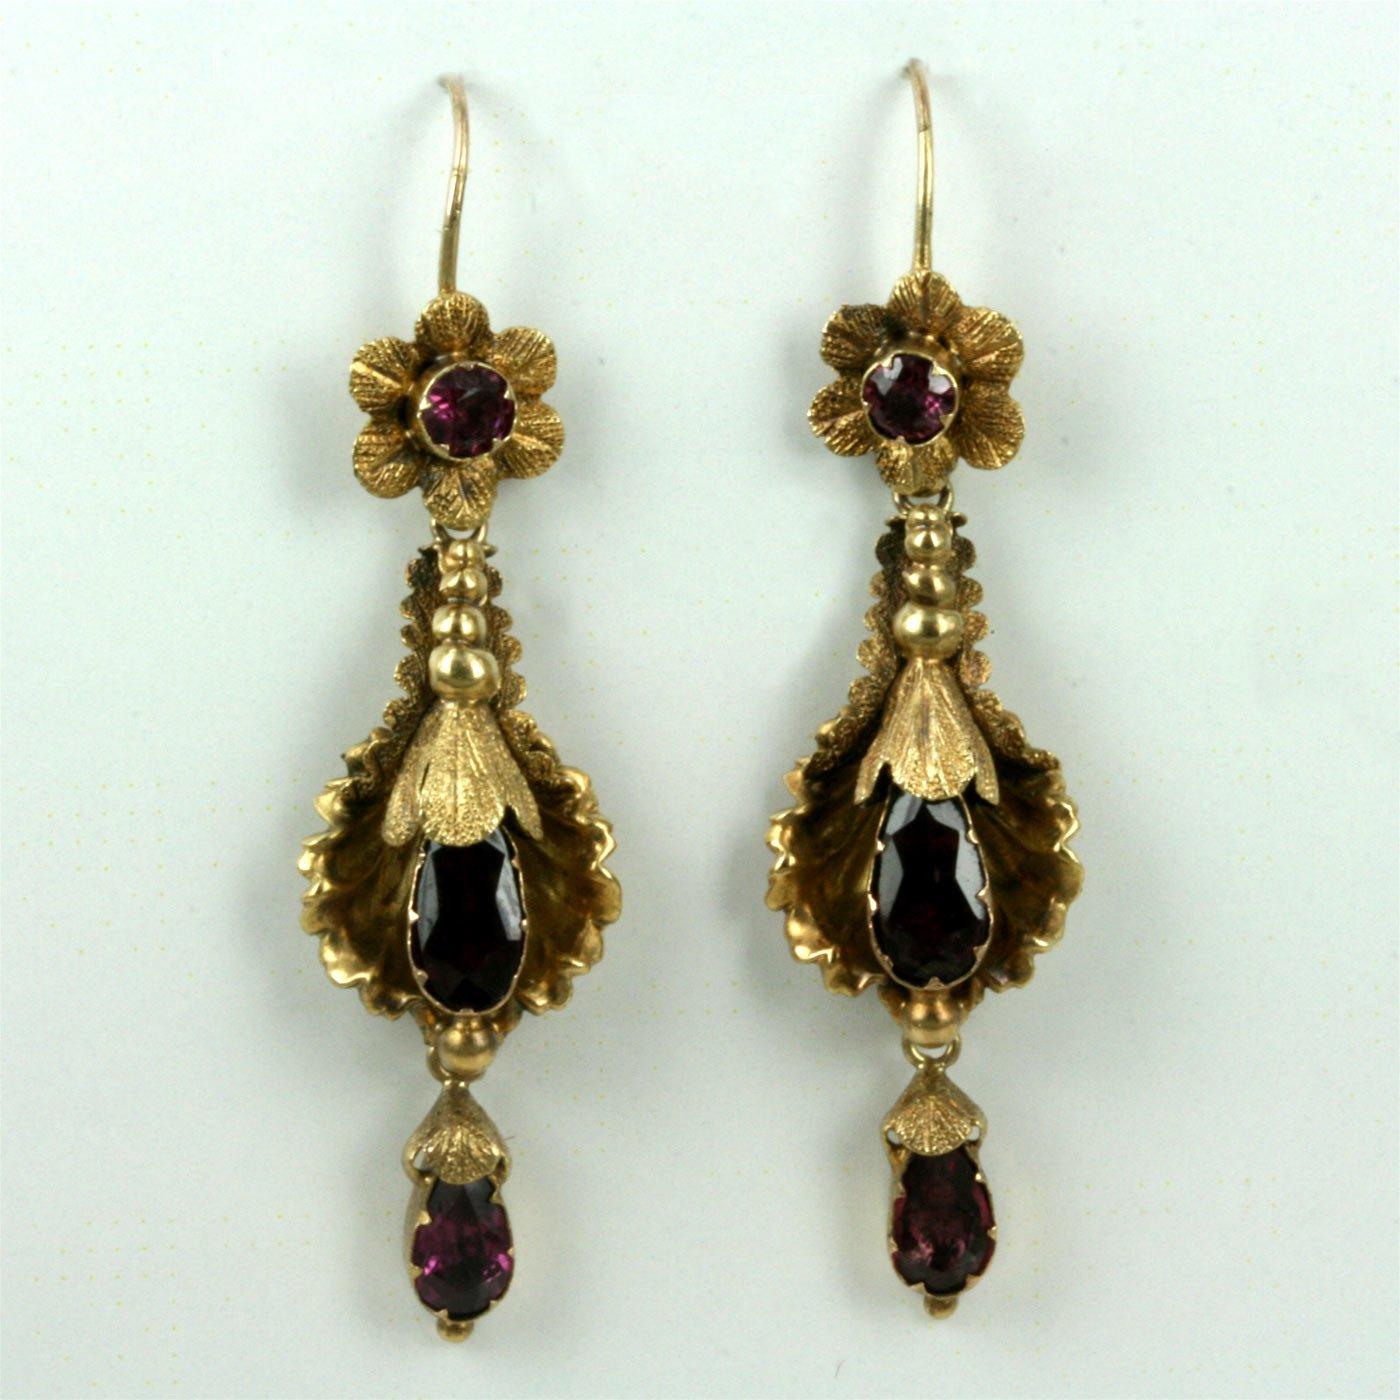 Antique Gold N Jadtar Set: Buy Stunning Antique Garnet Earrings In 15ct Gold. Sold